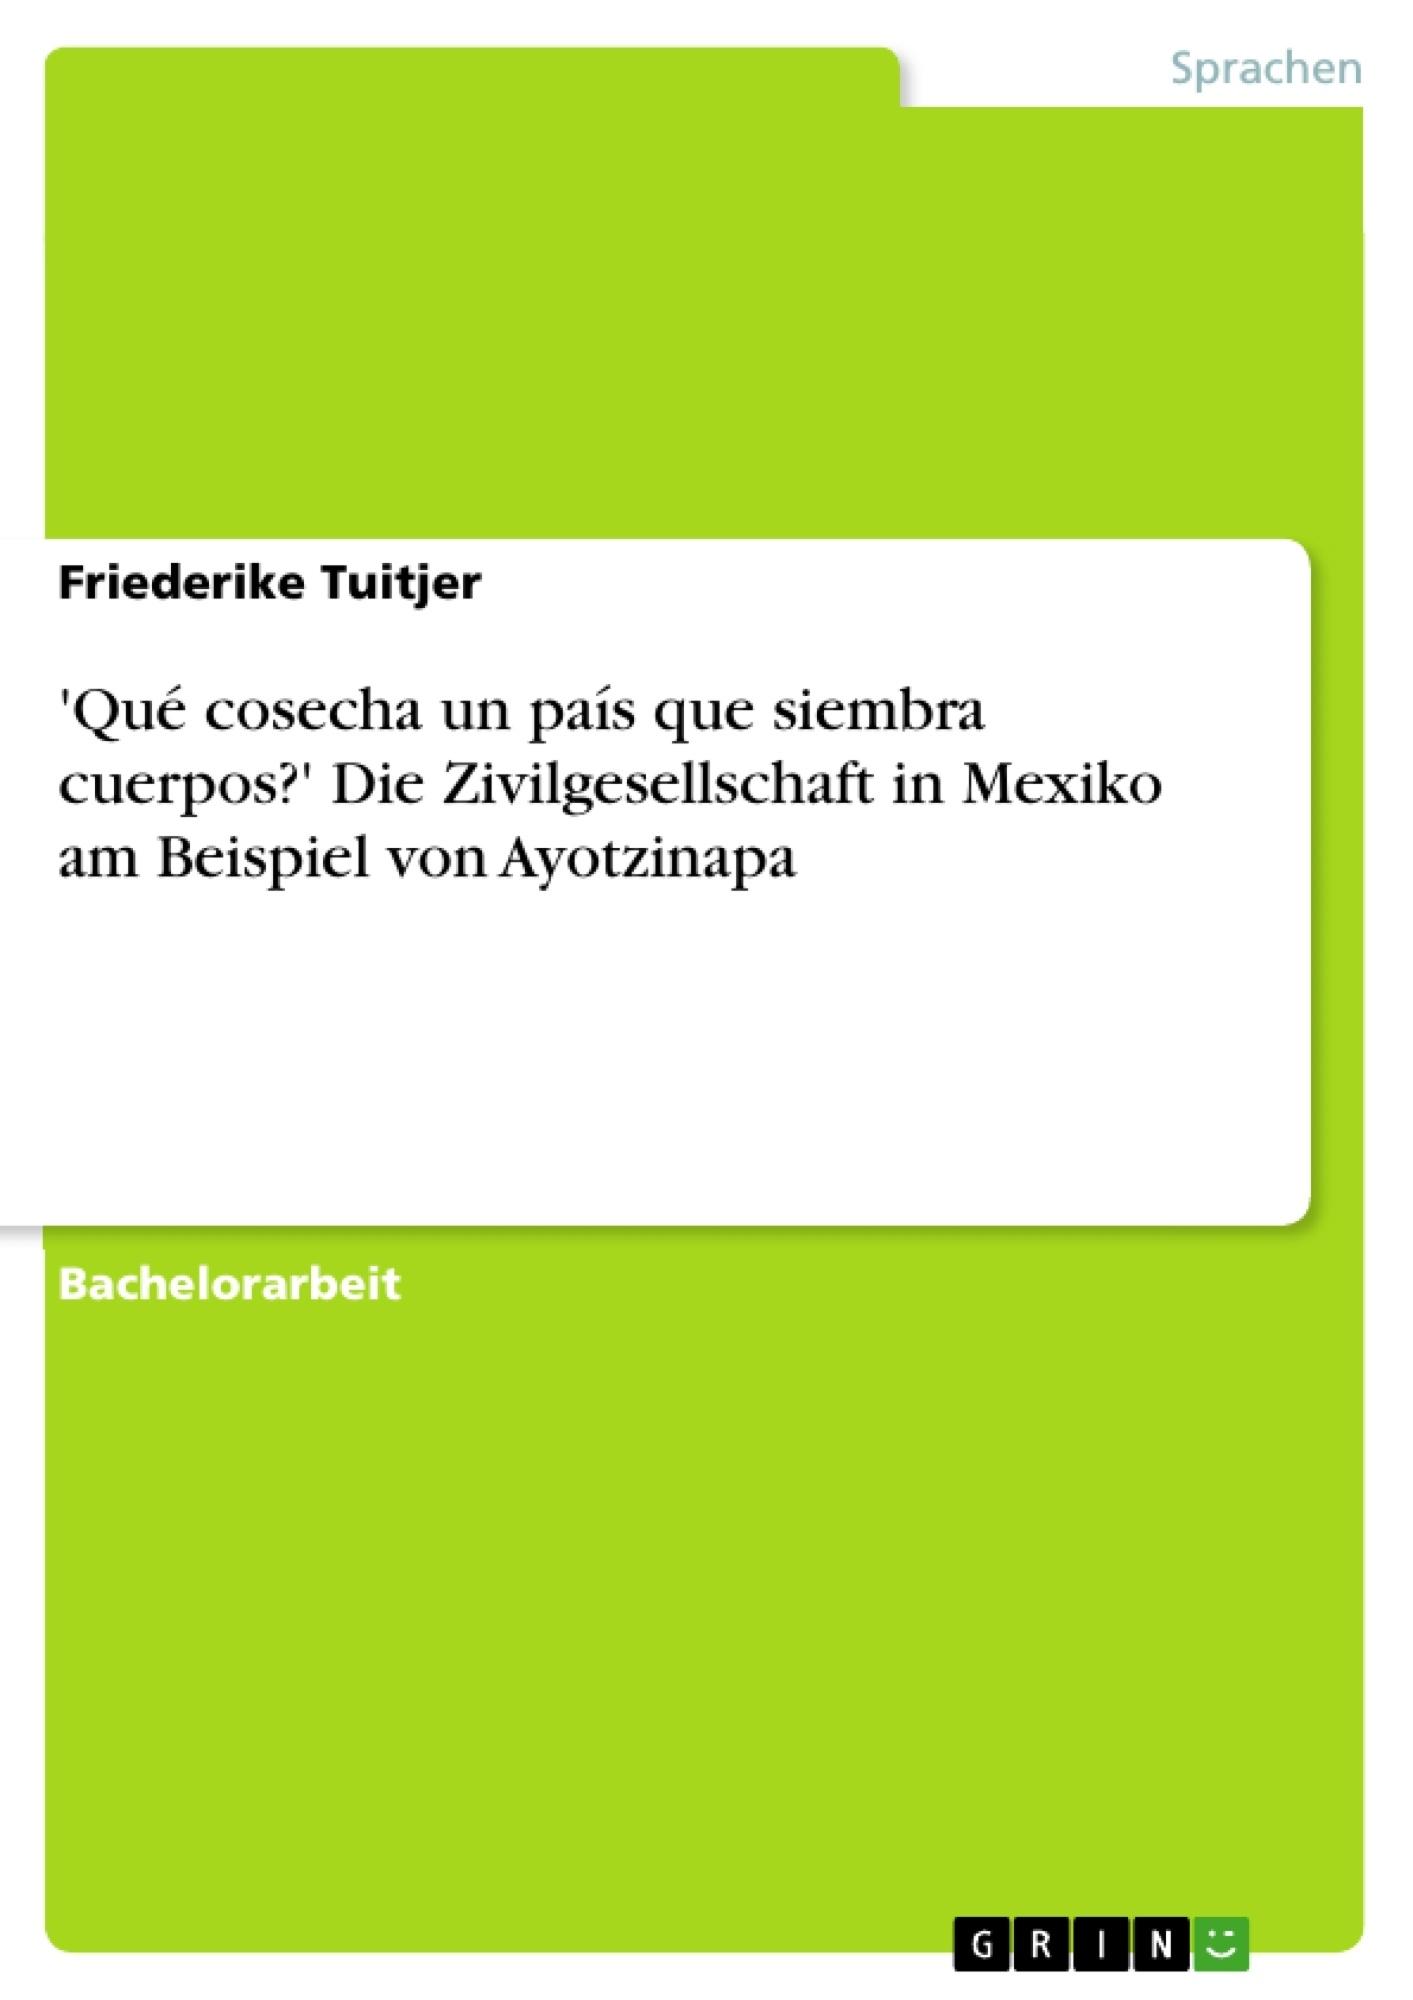 Titel: 'Qué cosecha un país que siembra cuerpos?' Die Zivilgesellschaft in Mexiko am Beispiel von Ayotzinapa